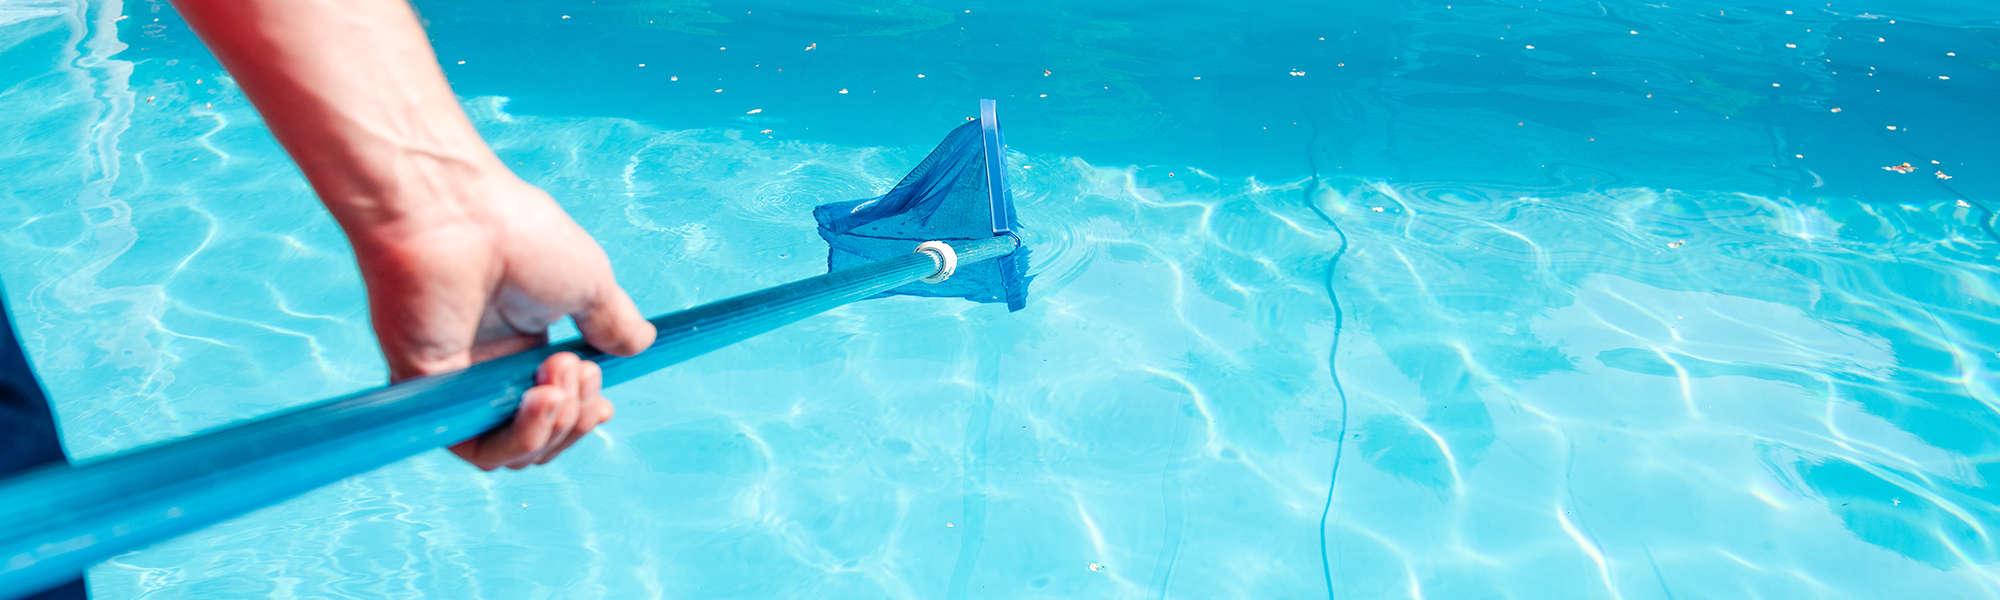 Entretien piscine